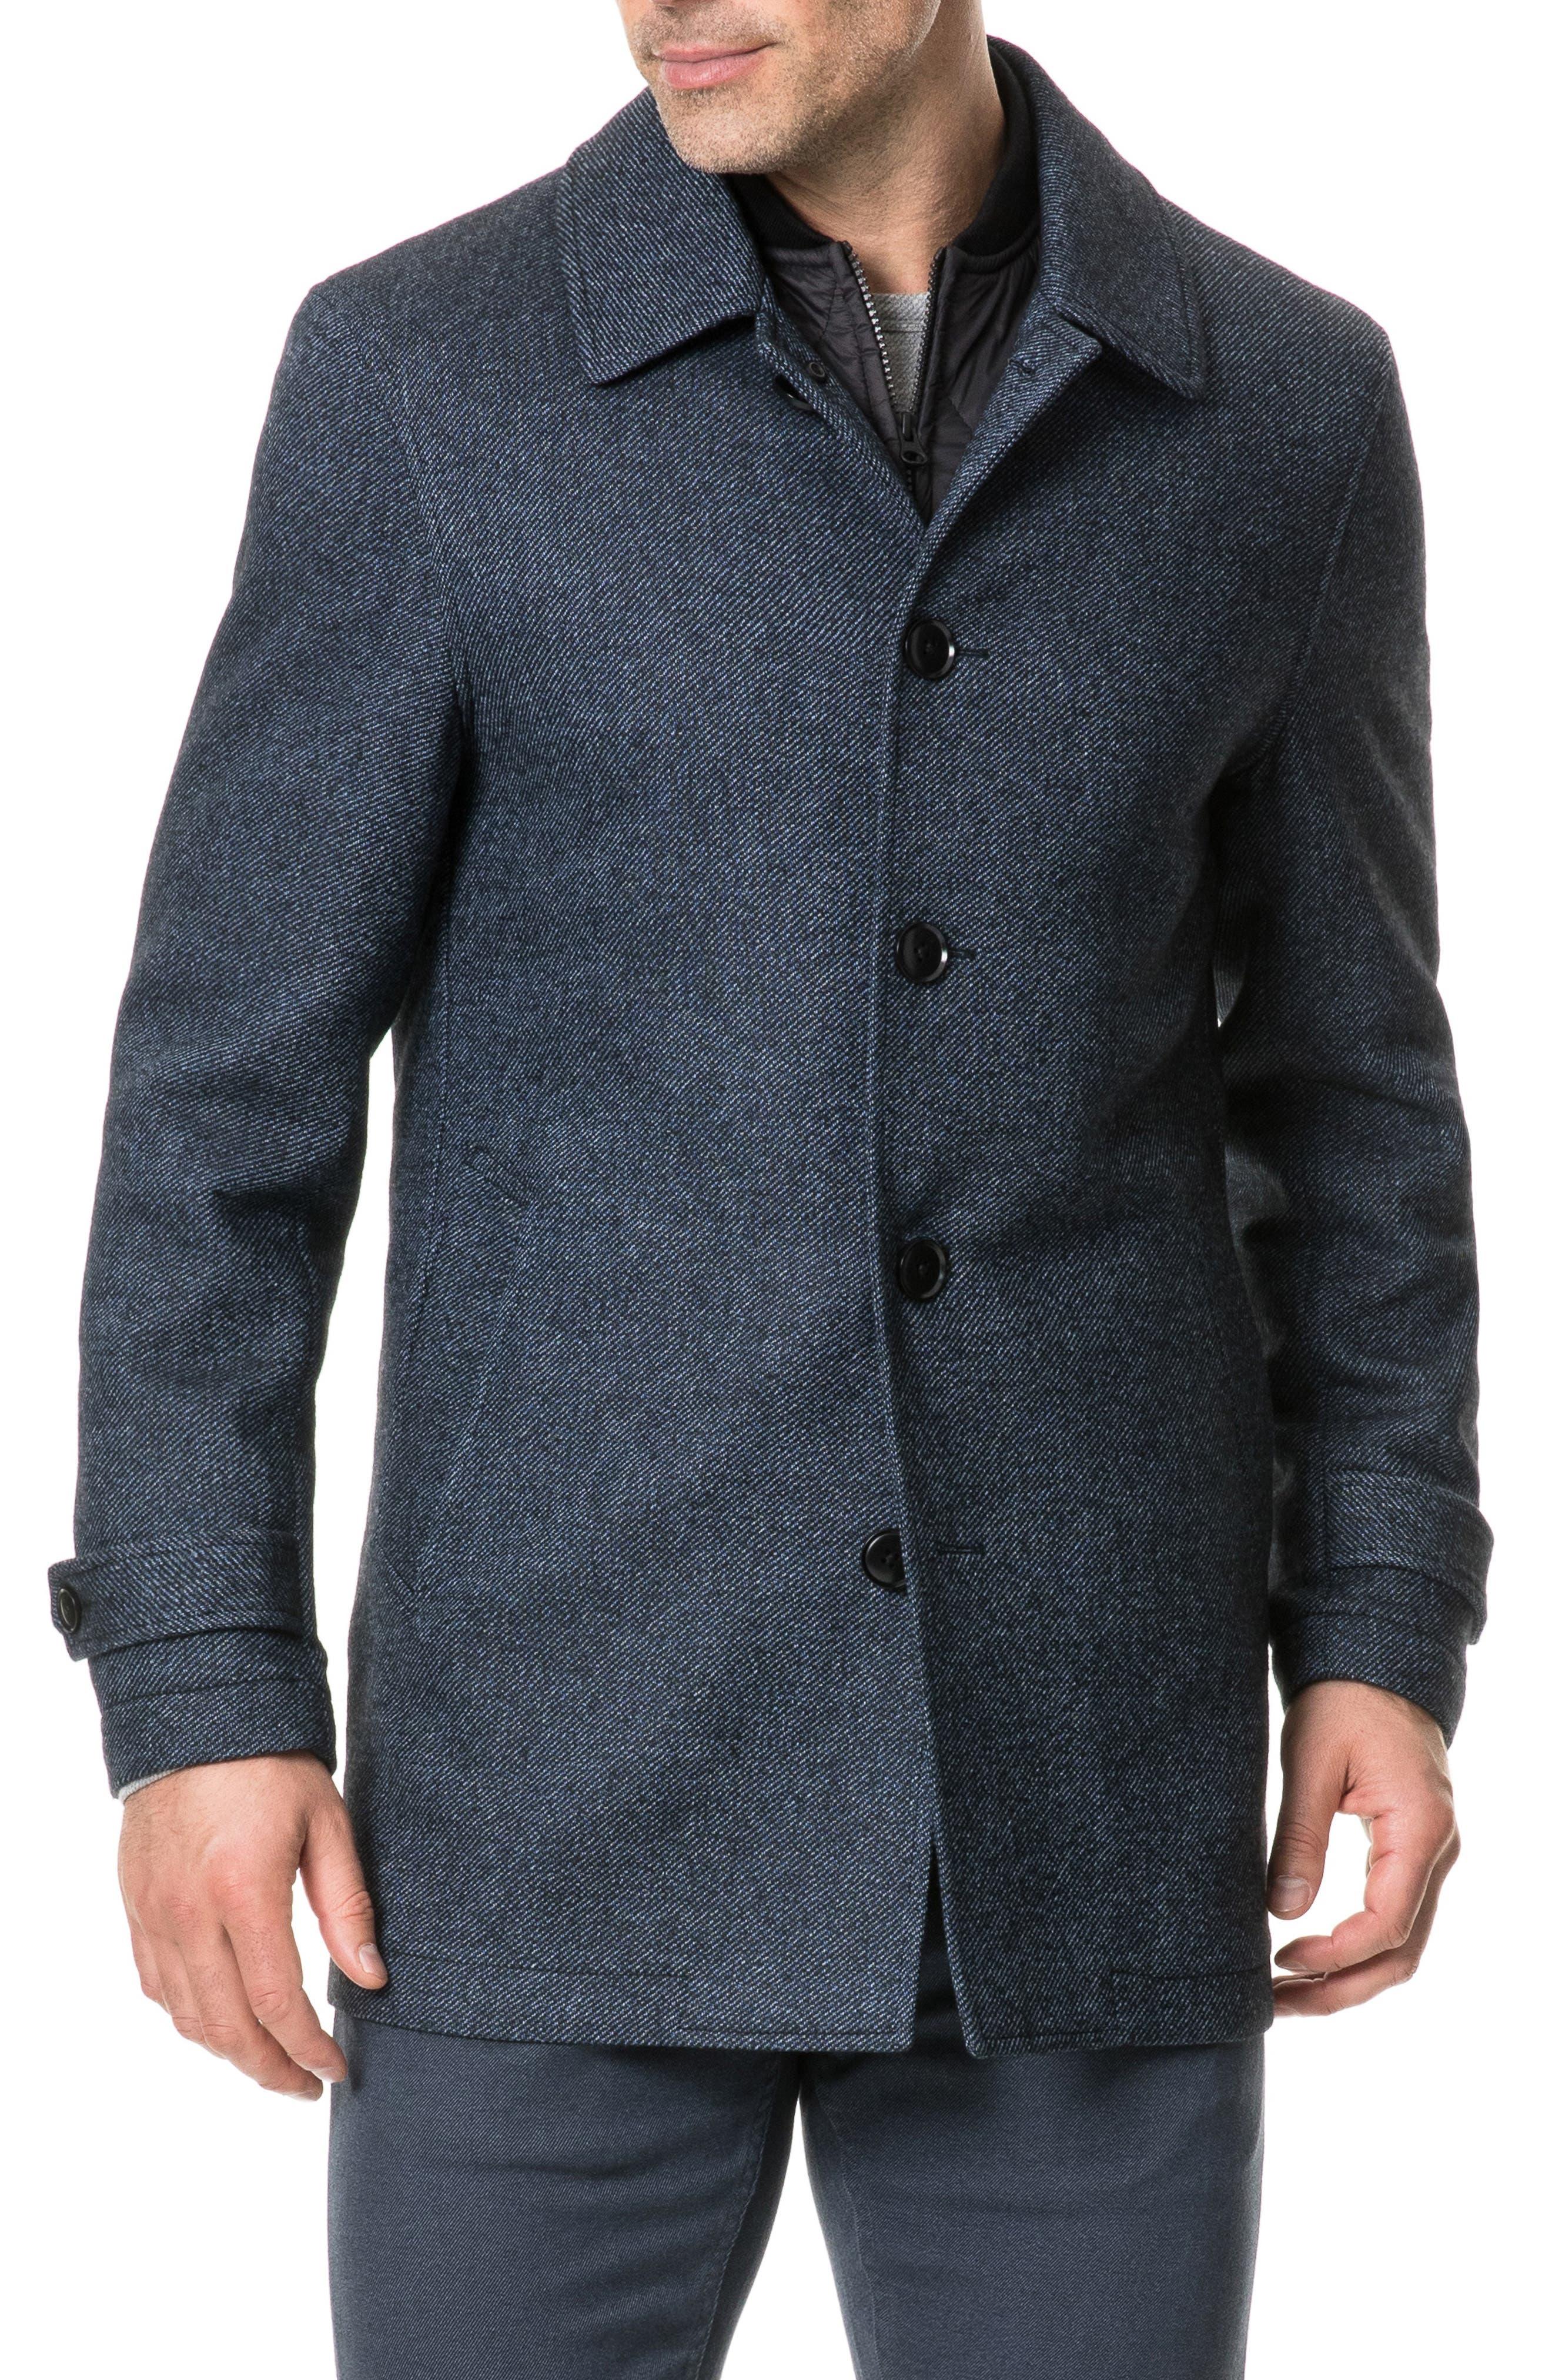 Balmoral Forest Regular Fit Coat,                             Main thumbnail 1, color,                             PEACOAT